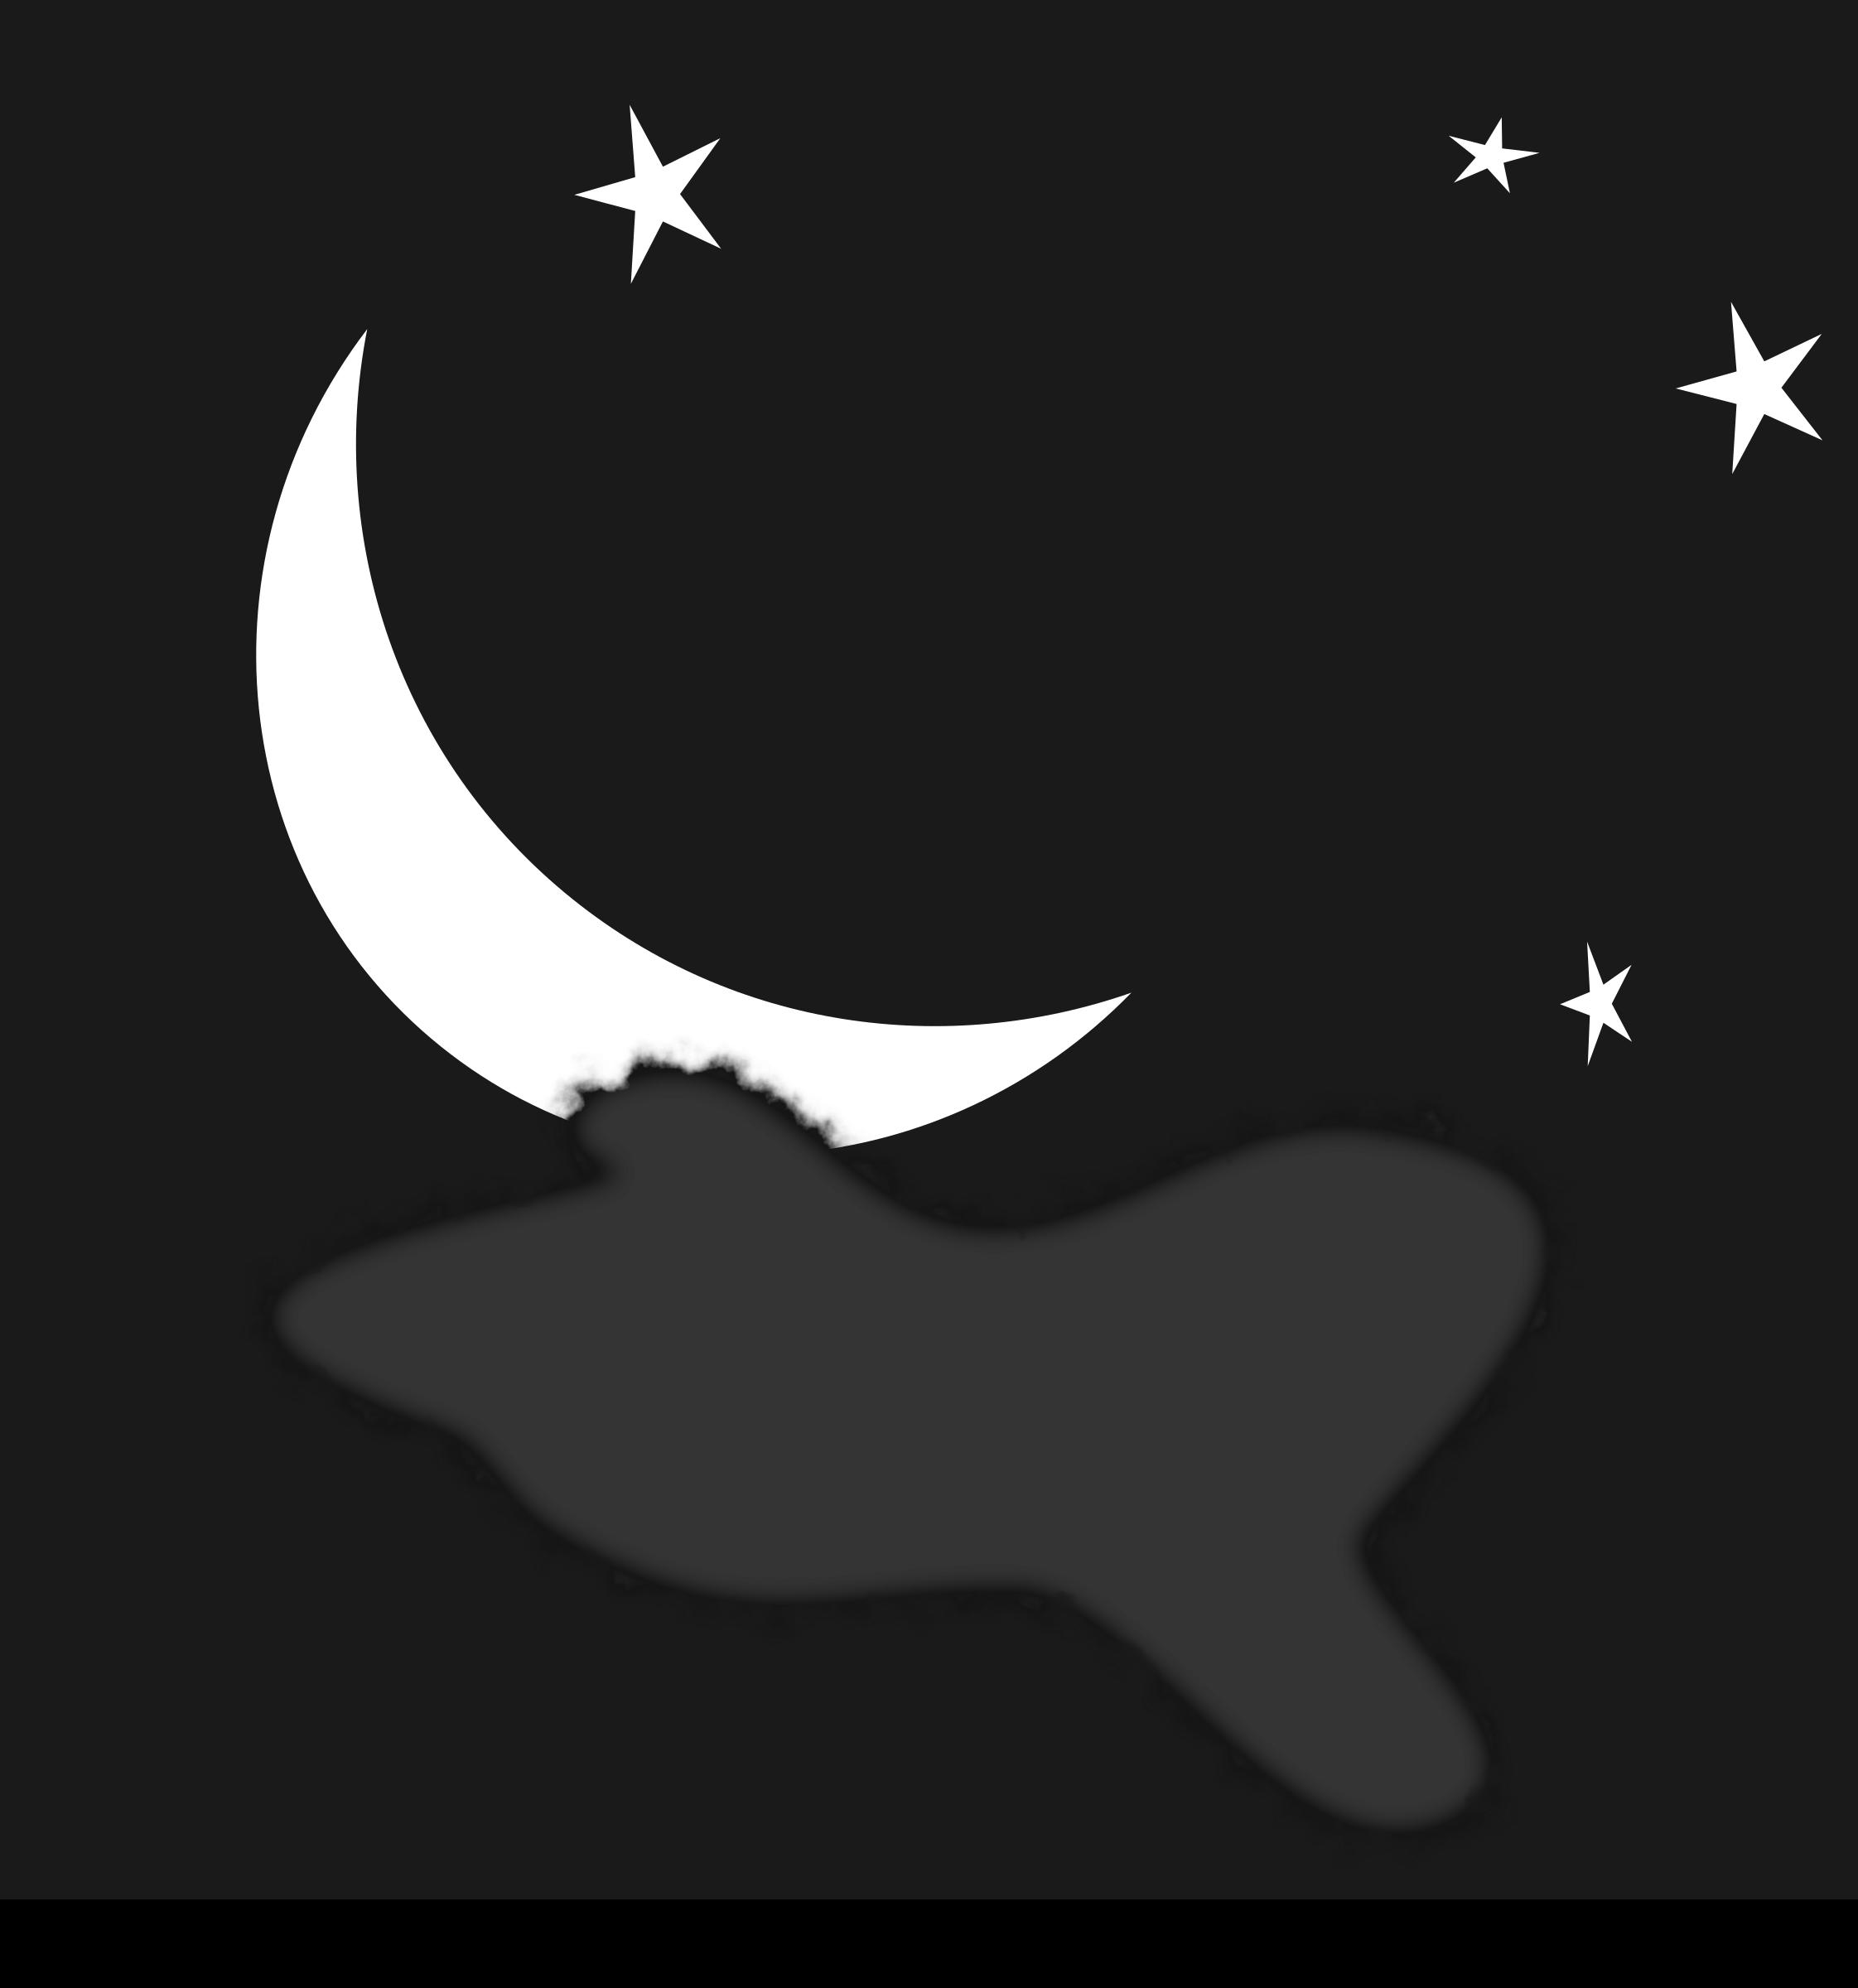 Black night clipart jpg royalty free stock Free Black Sky Cliparts, Download Free Clip Art, Free Clip Art on ... jpg royalty free stock